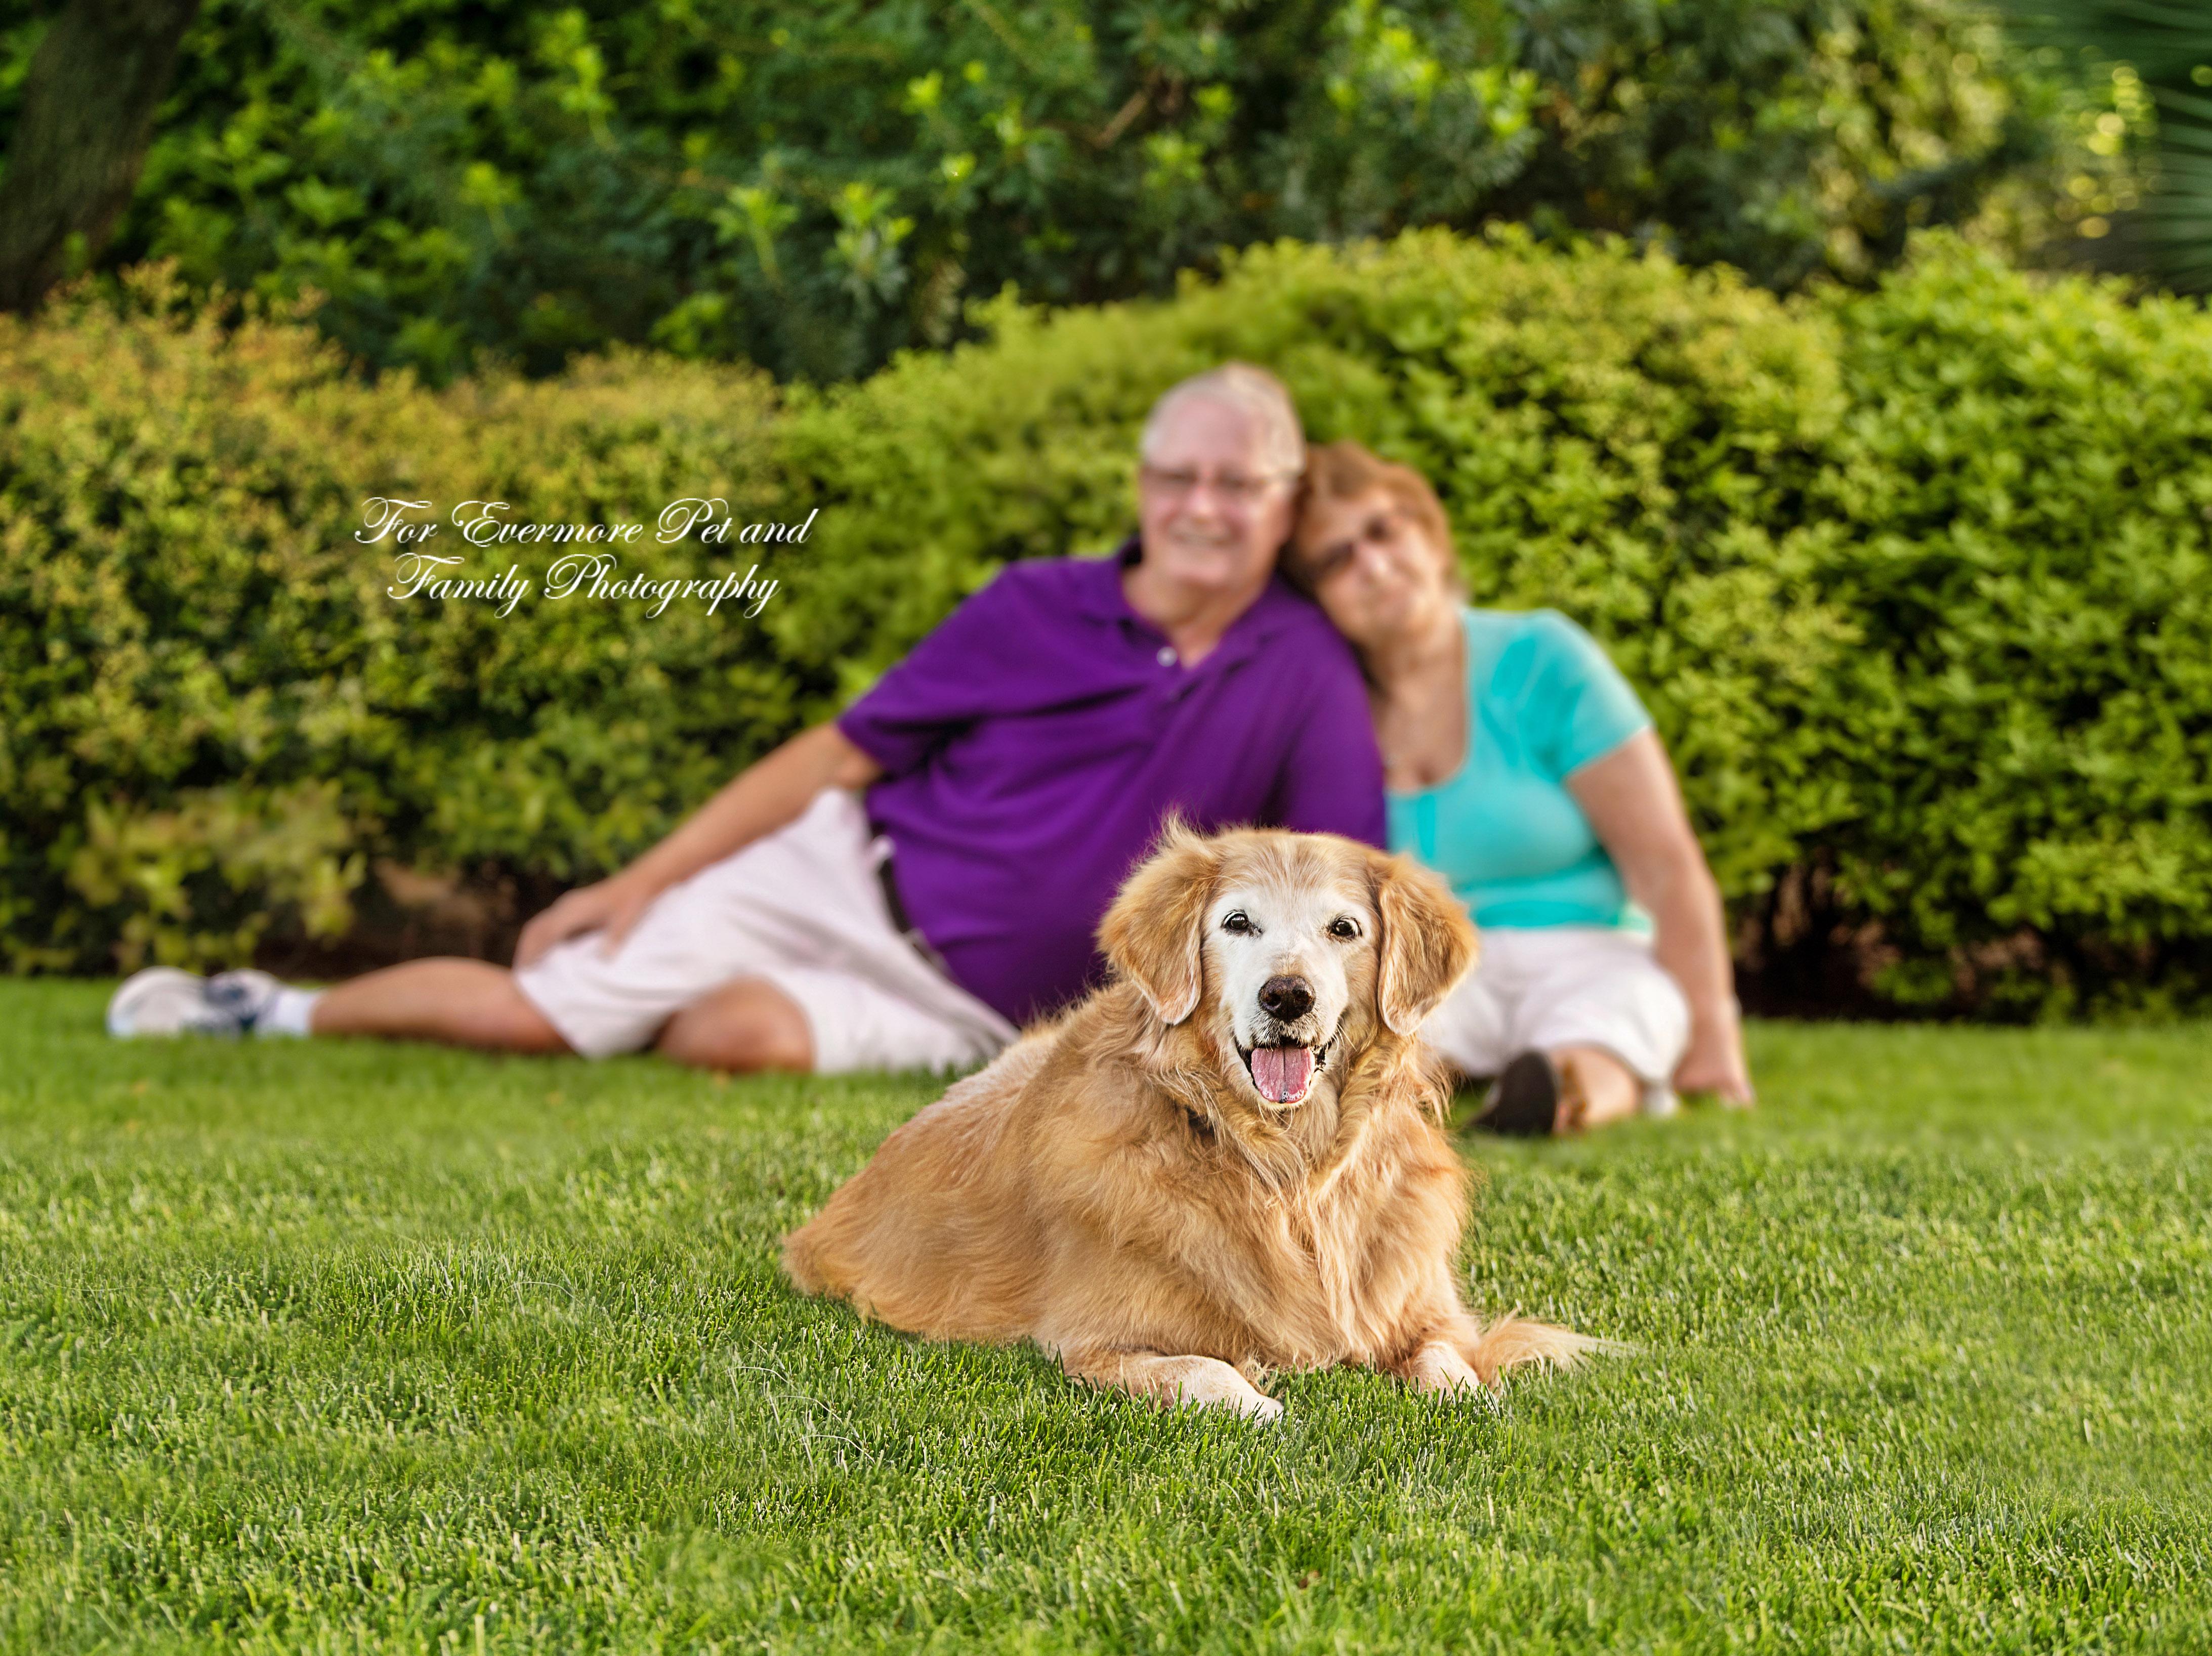 Lovie and her family